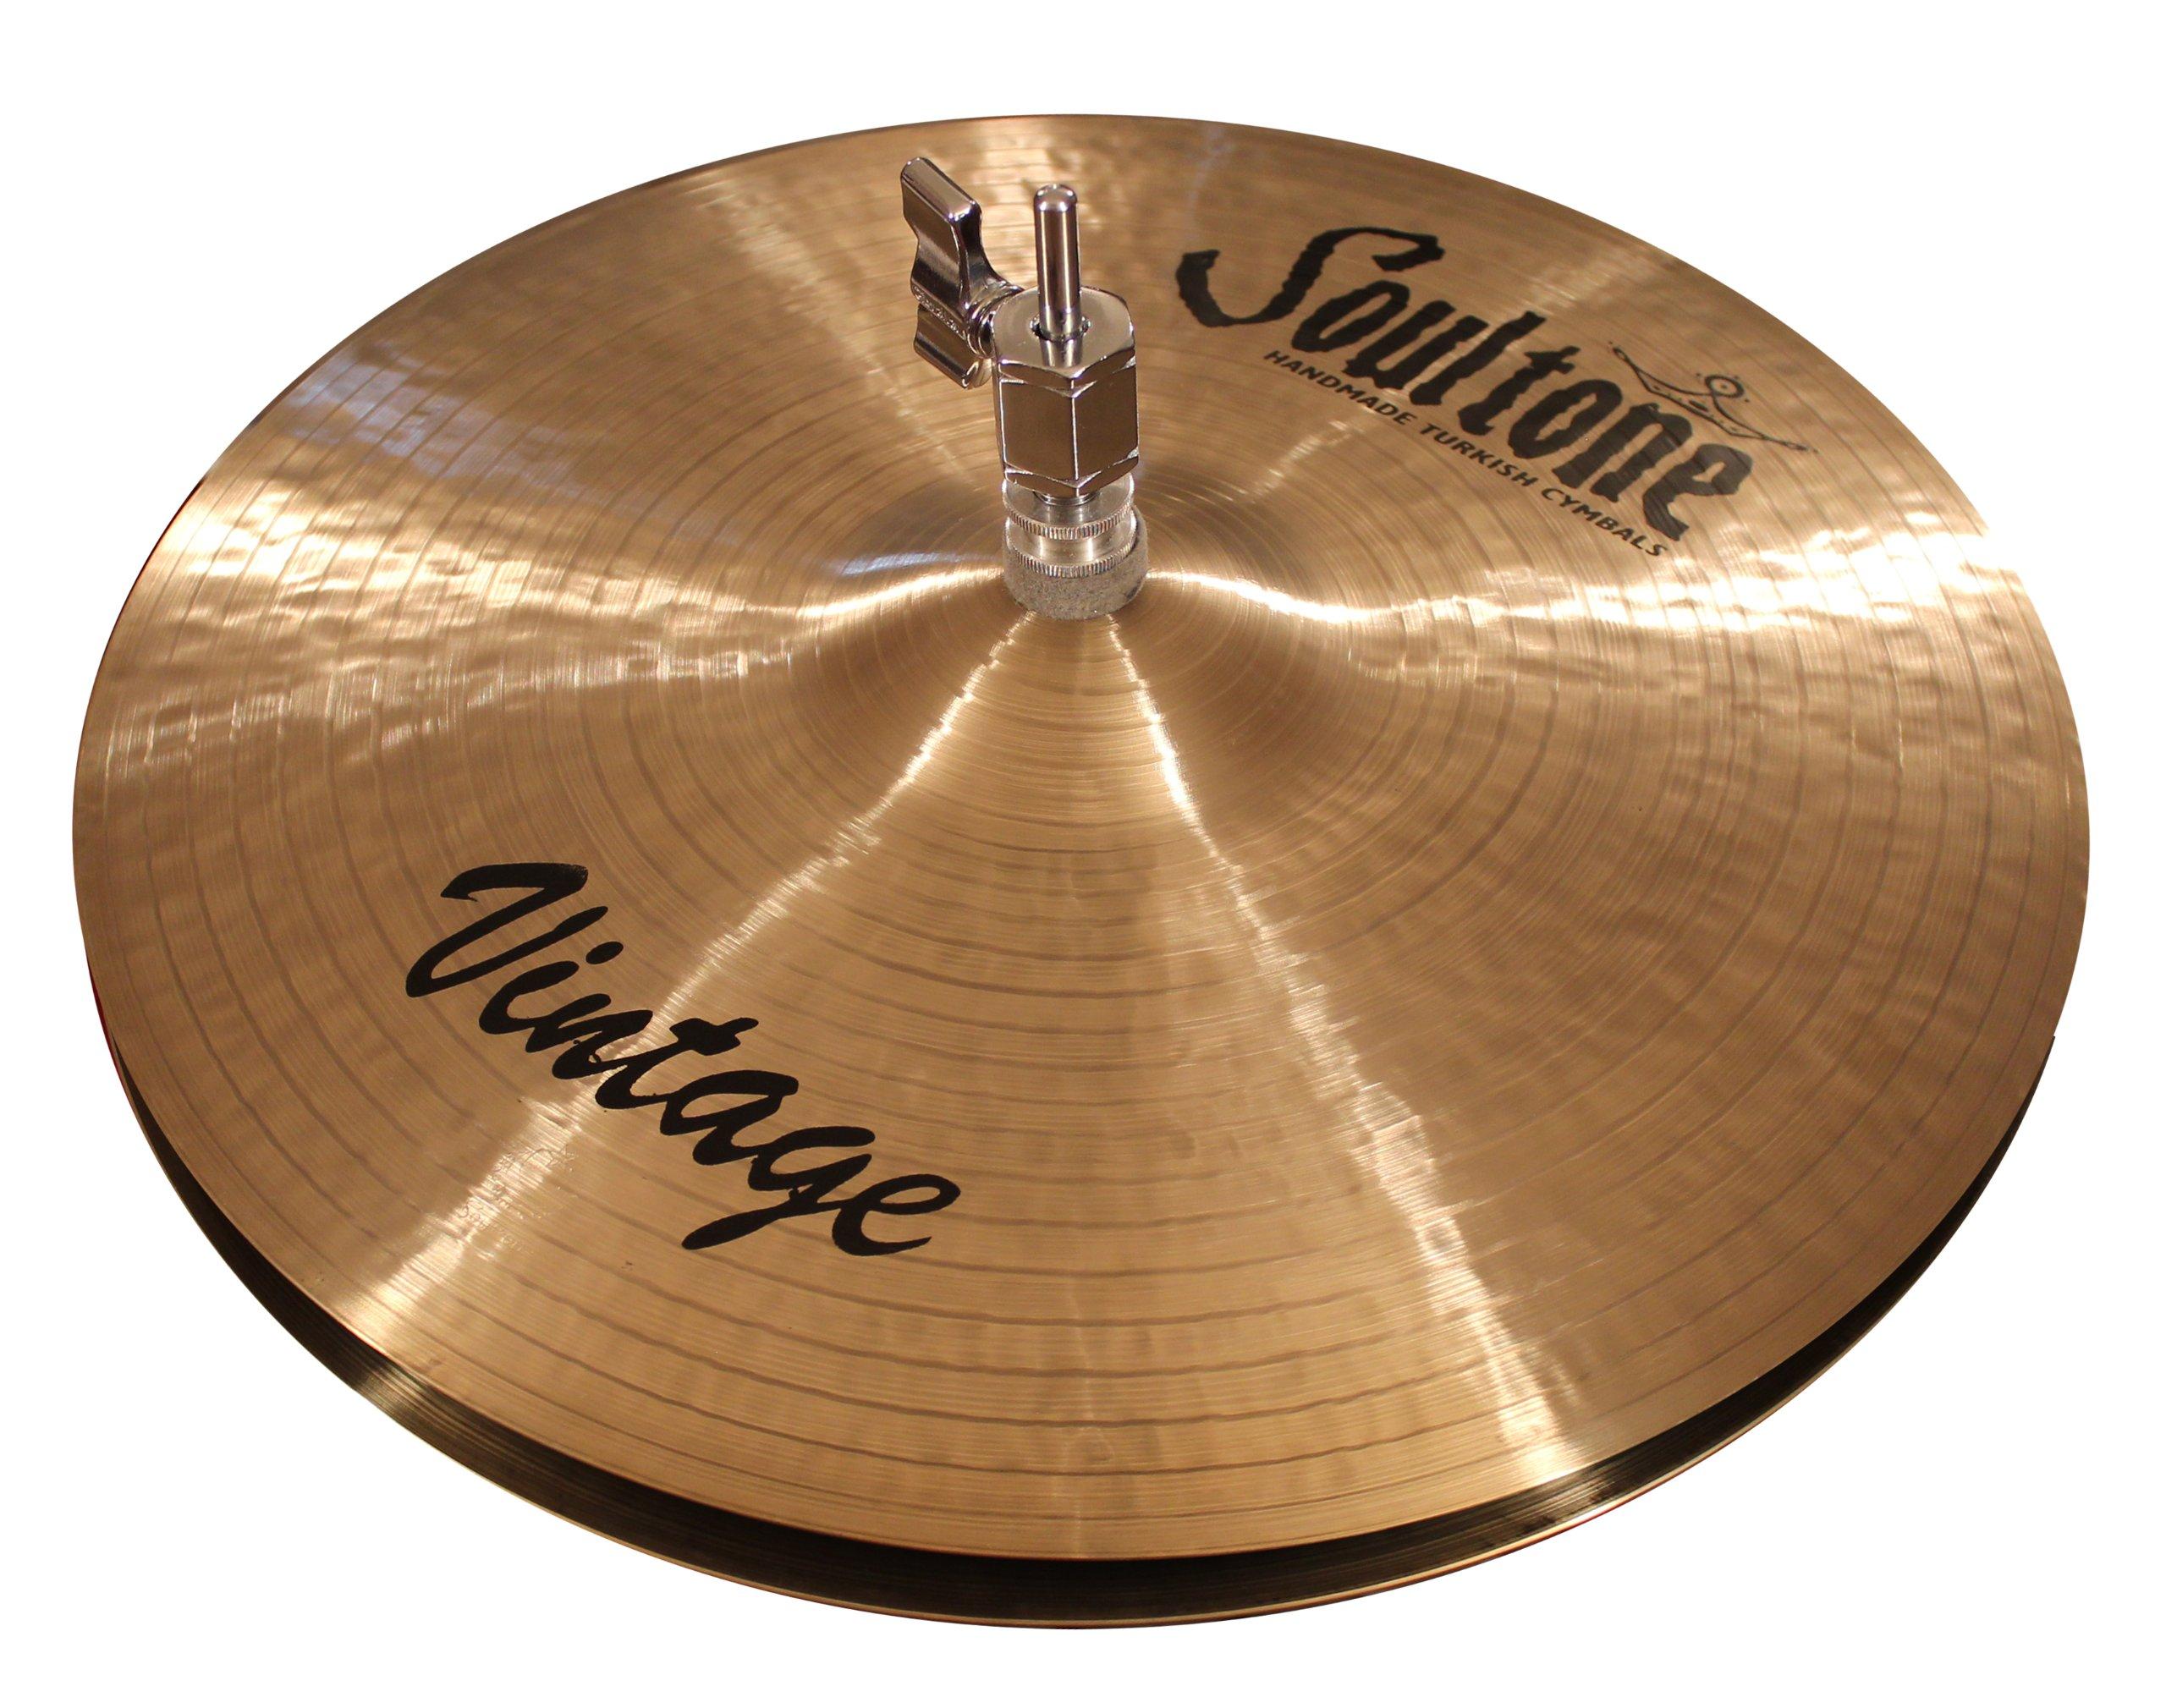 Soultone Cymbals VNT-HHT16-16'' Vintage Hi Hats Pair by Soultone Cymbals